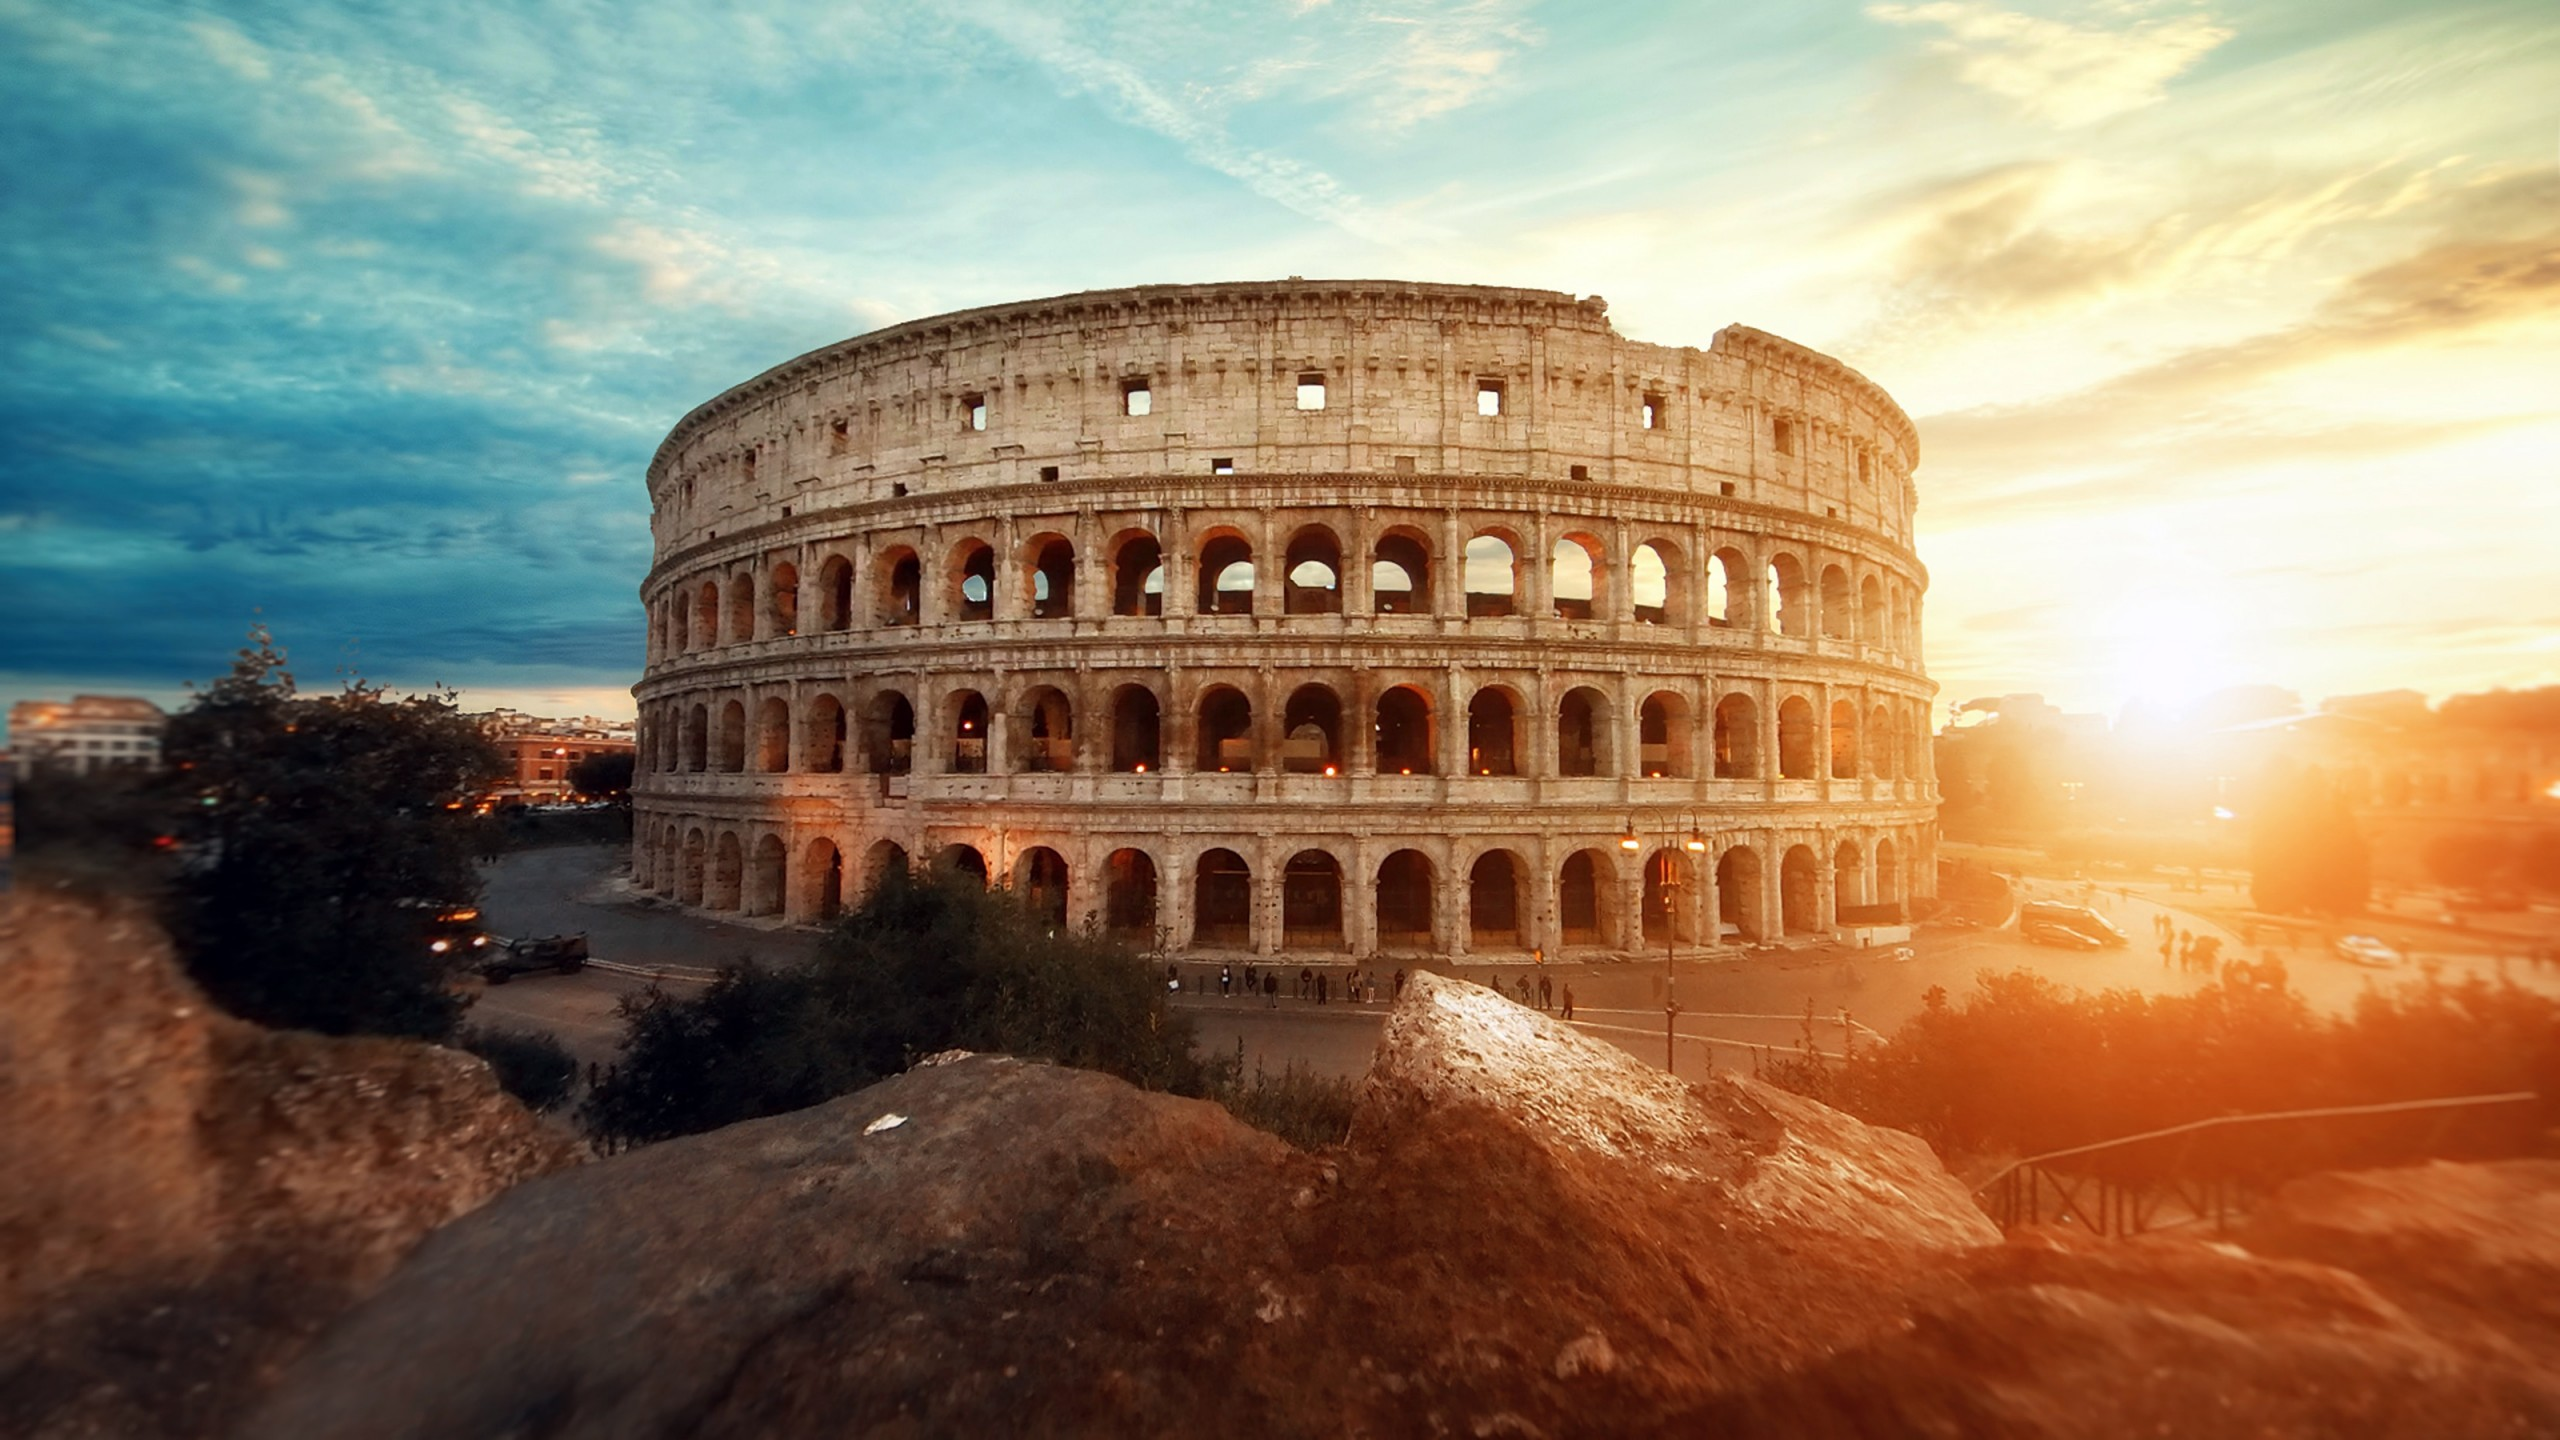 Wallpaper Roman Colosseum at sunset